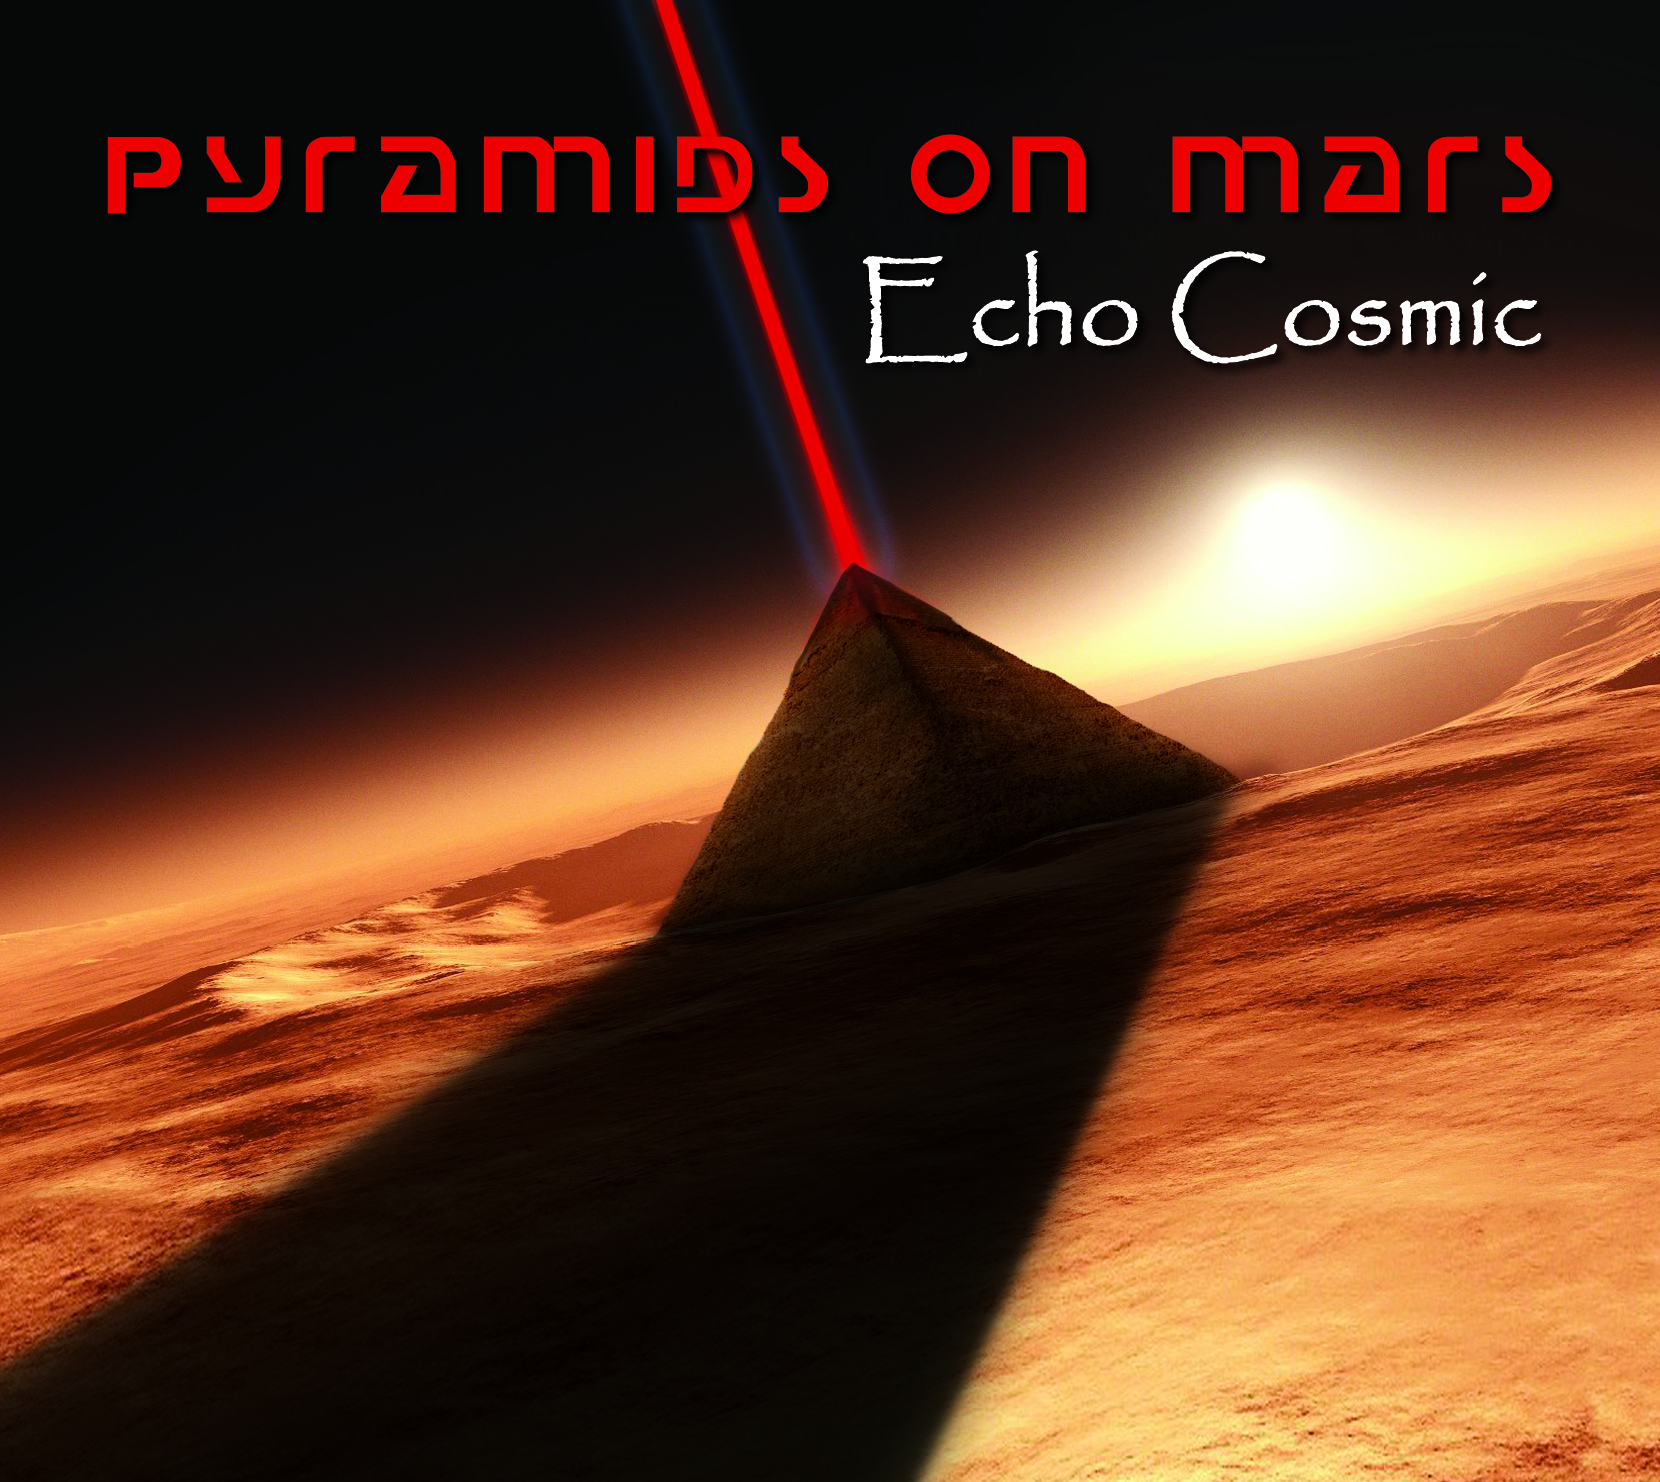 PYRAMIDS ON MARS New Album 'Echo Cosmic'